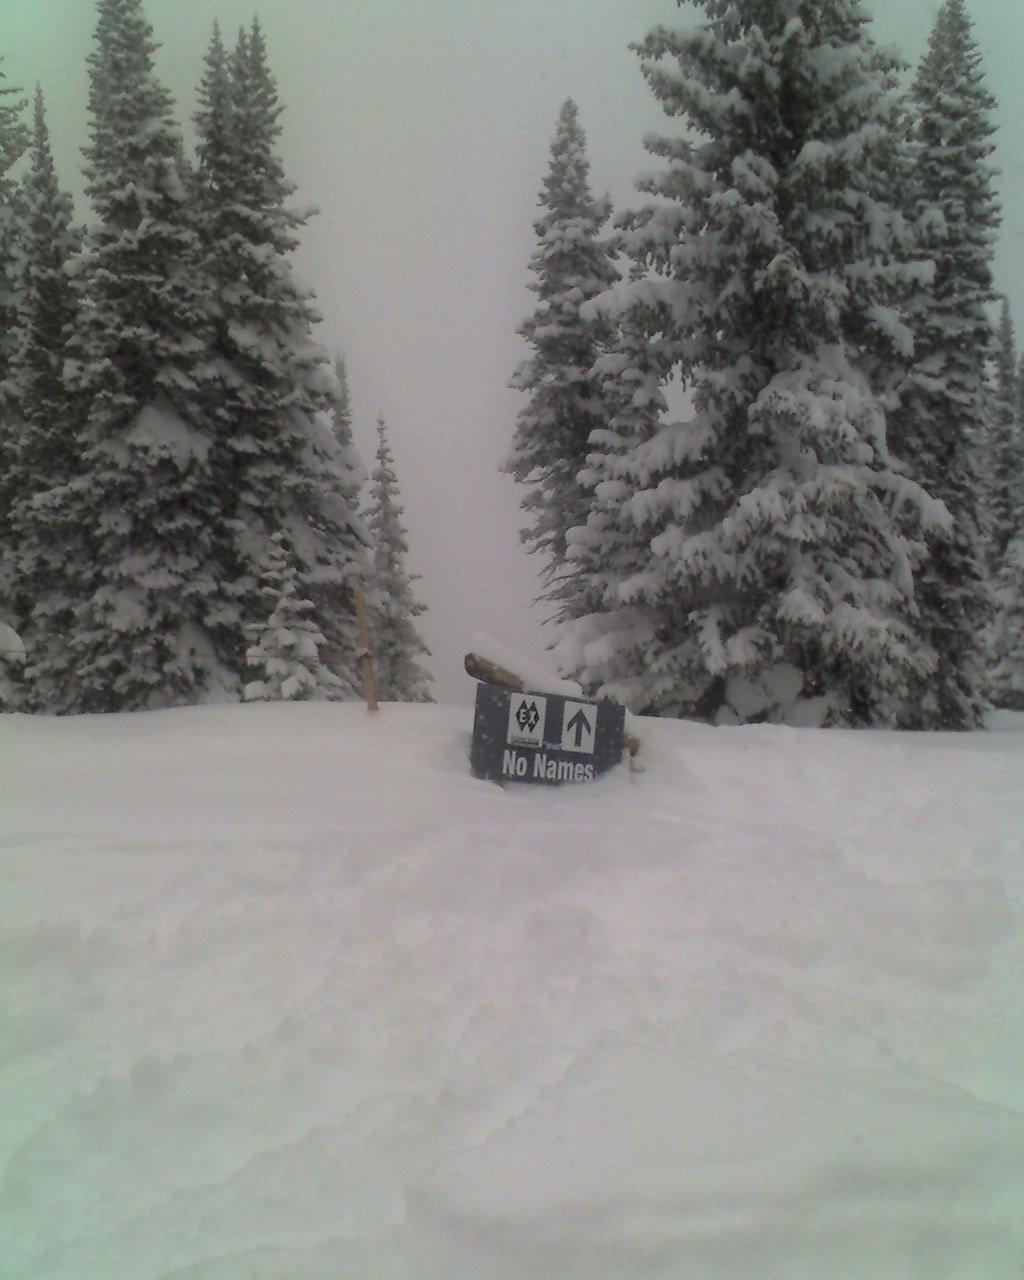 Skiing - 14 of 18